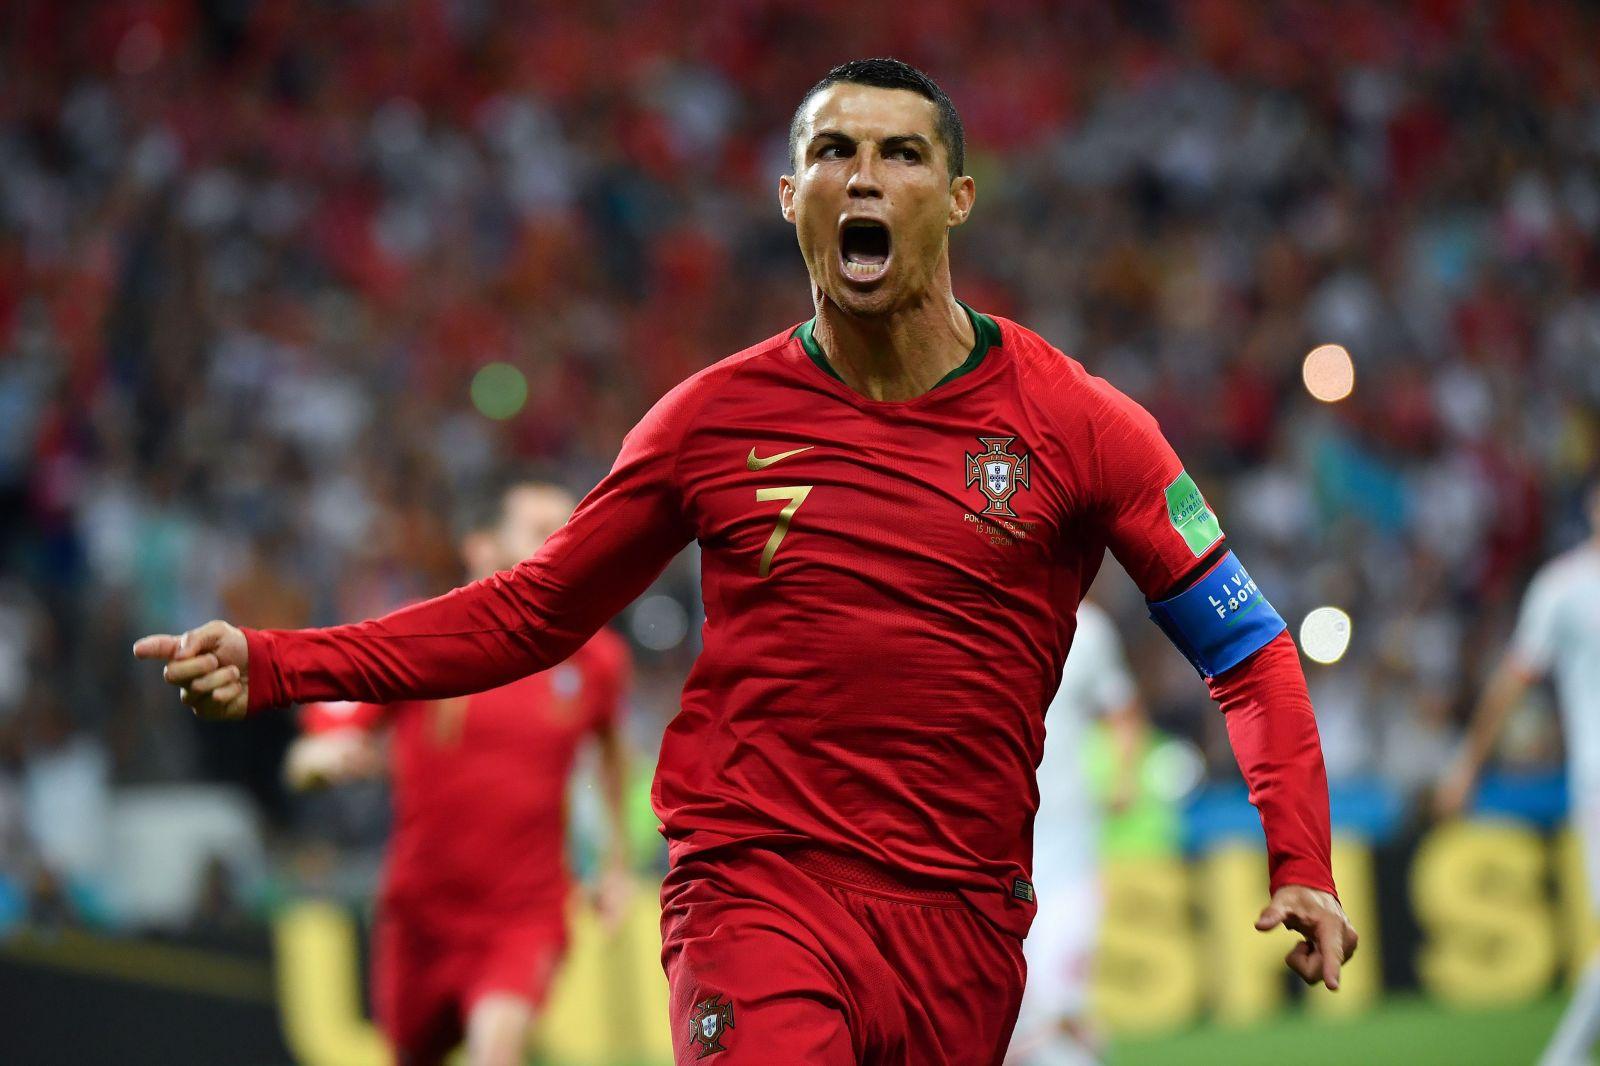 Laga Lithuania vs Portugal pada Kualifikasi Piala Eropa 2020 menjadi panggung bagi Cristiano Ronaldo. Foto: Twitter UEFA Euro 2020